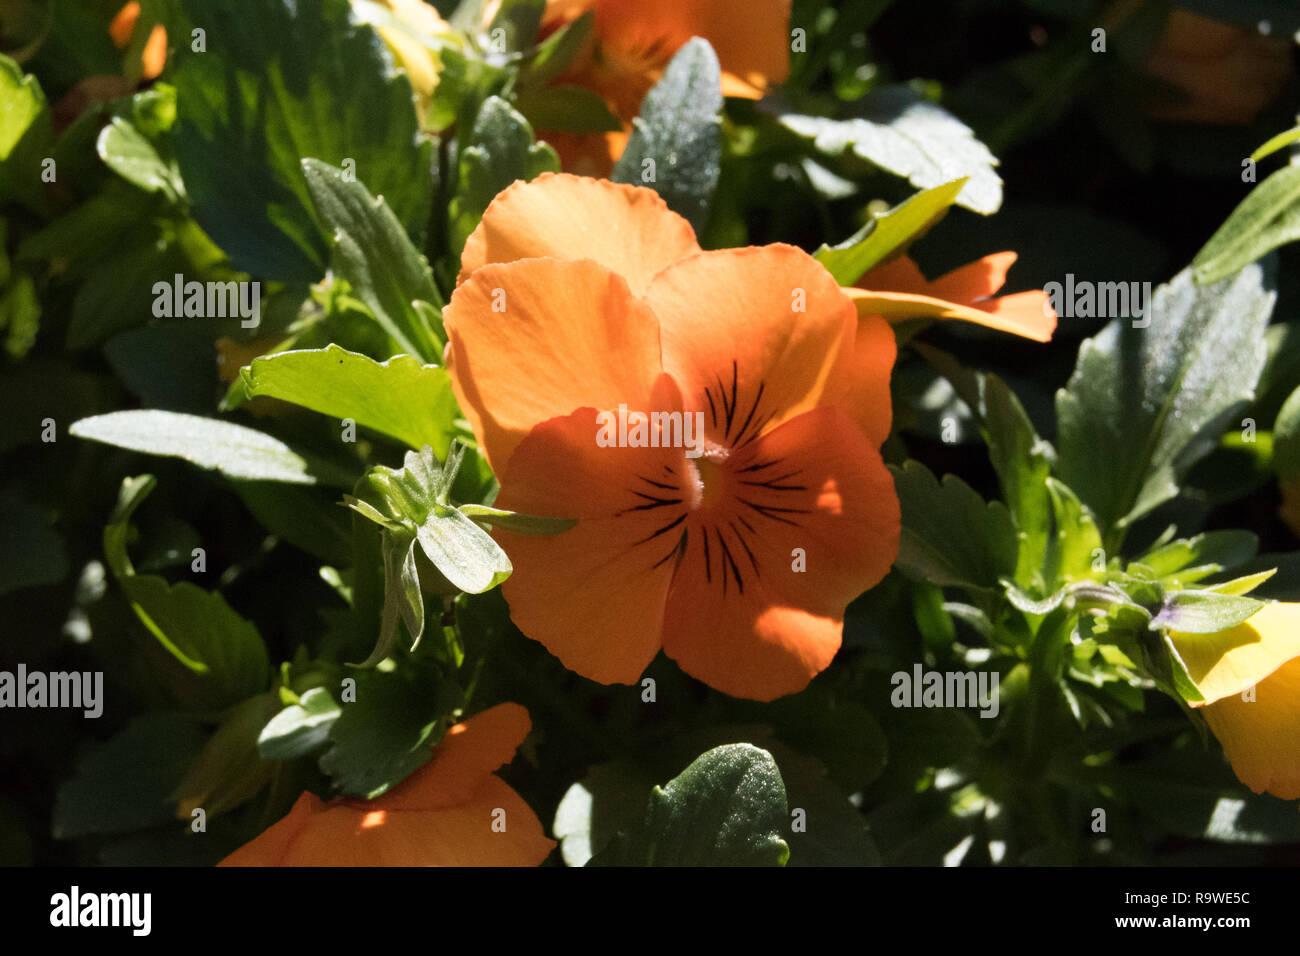 Orange pansy - Stock Image